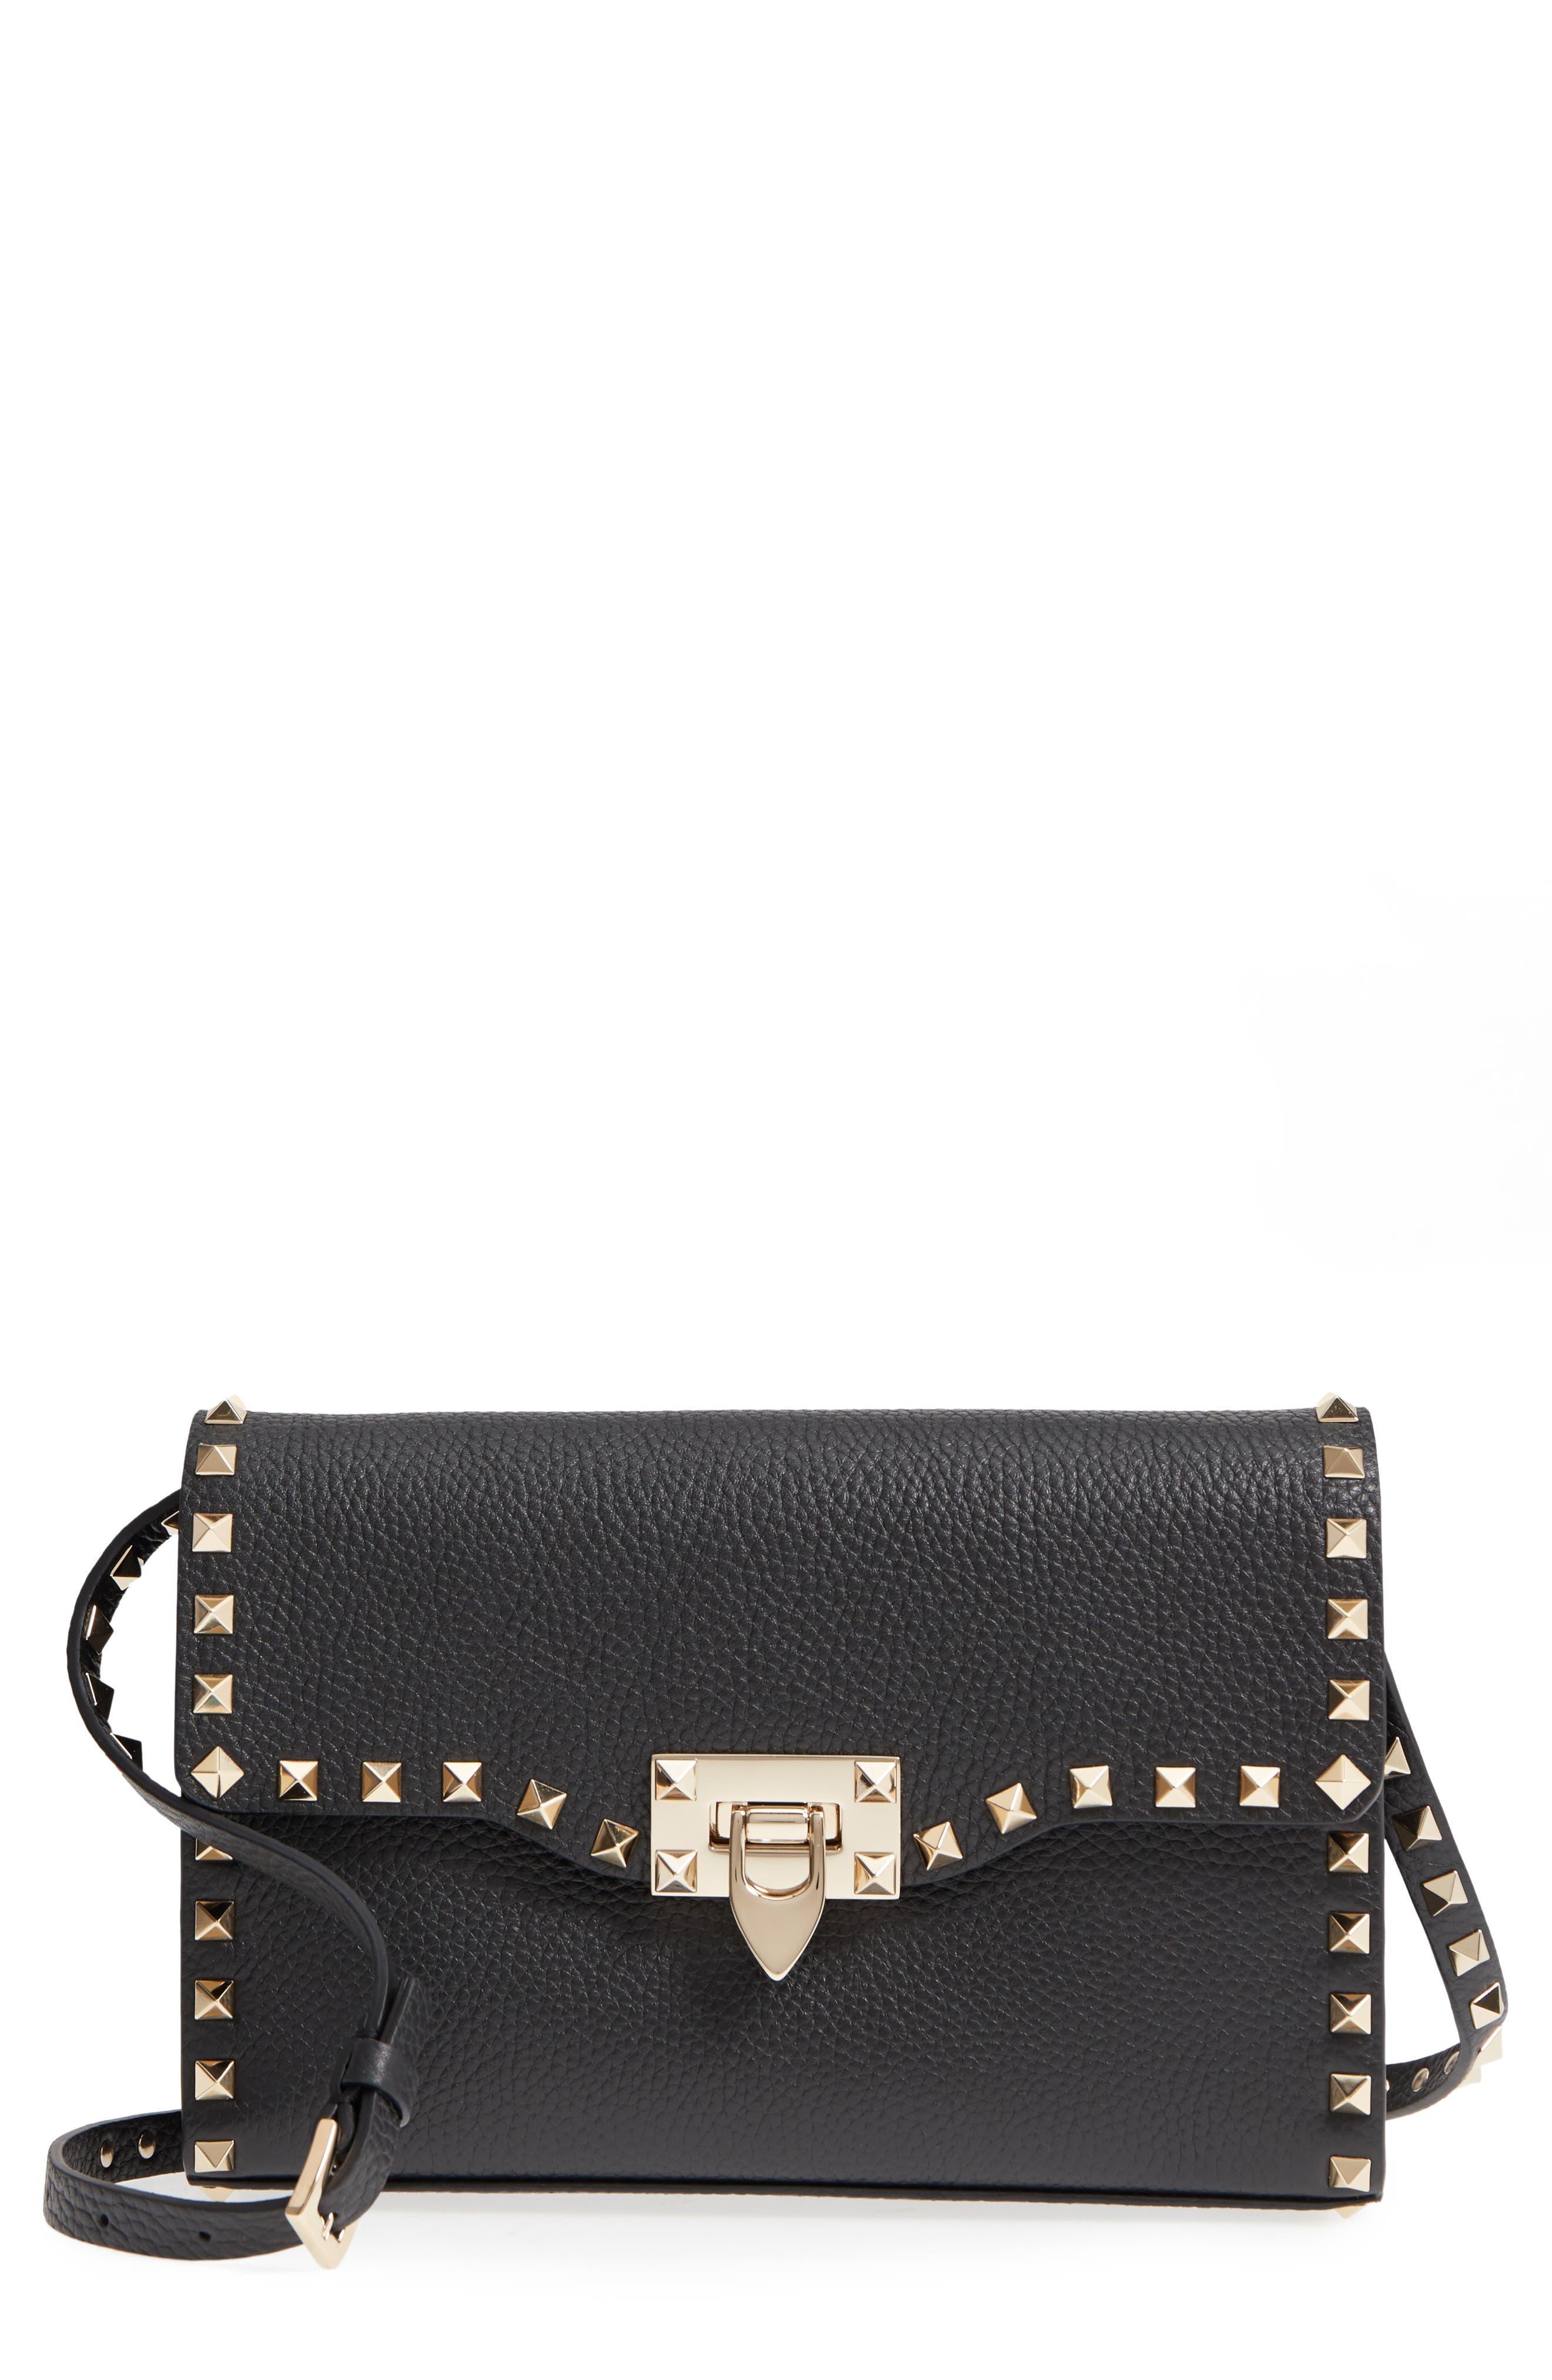 Rockstud Mini Calfskin Leather Crossbody - Black